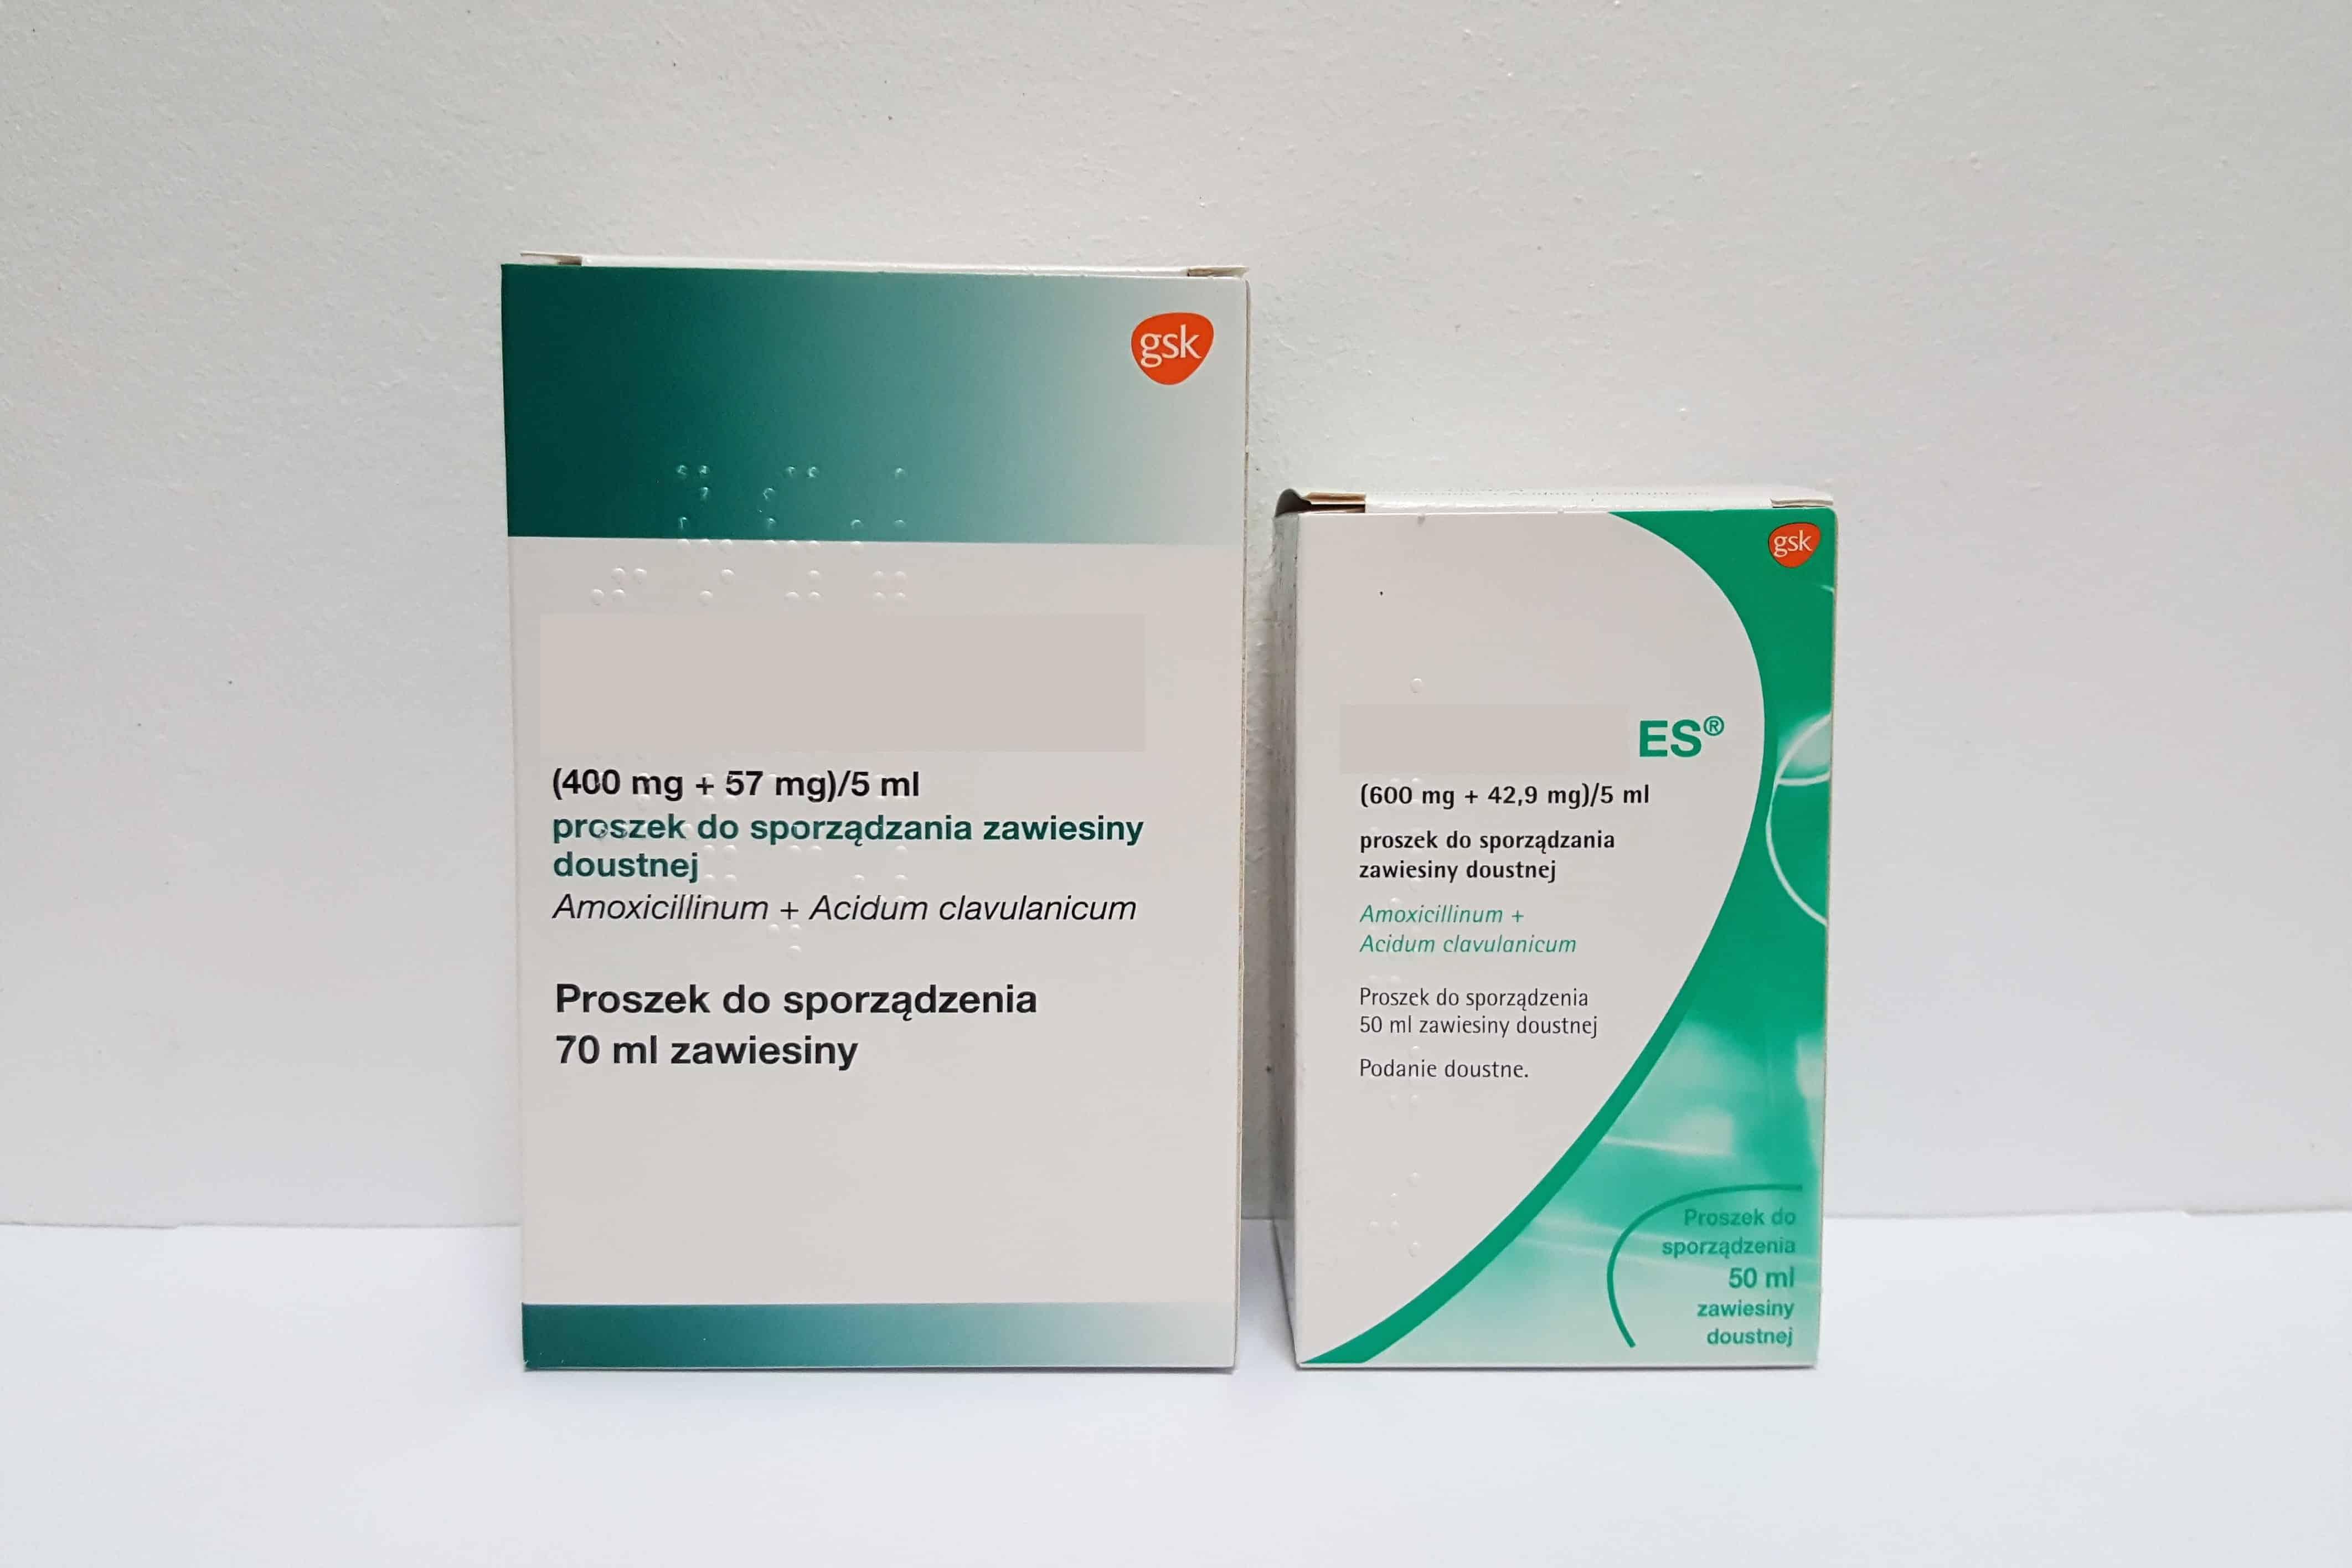 Augmentin iAugmentin ES antybiotyk wzawiesinie Matka Aptekarka